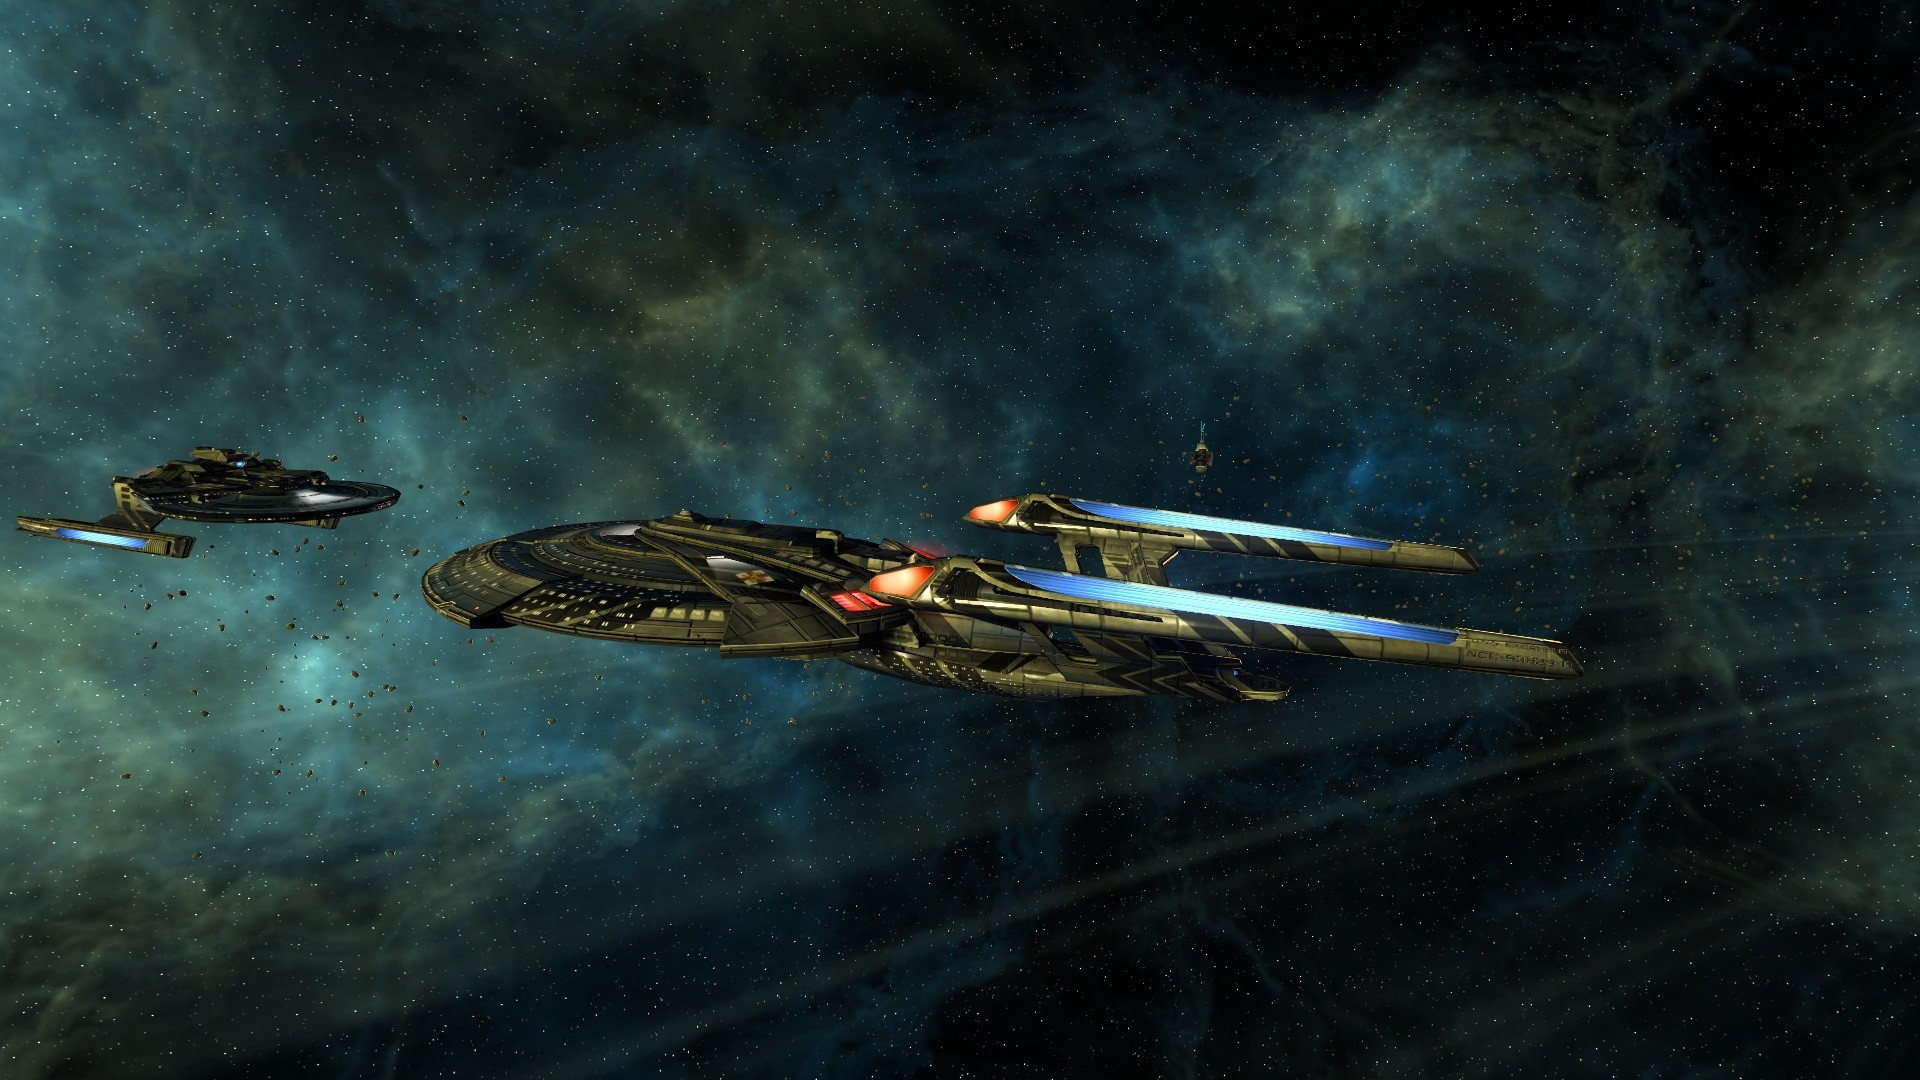 star trek space scenes – Google Search